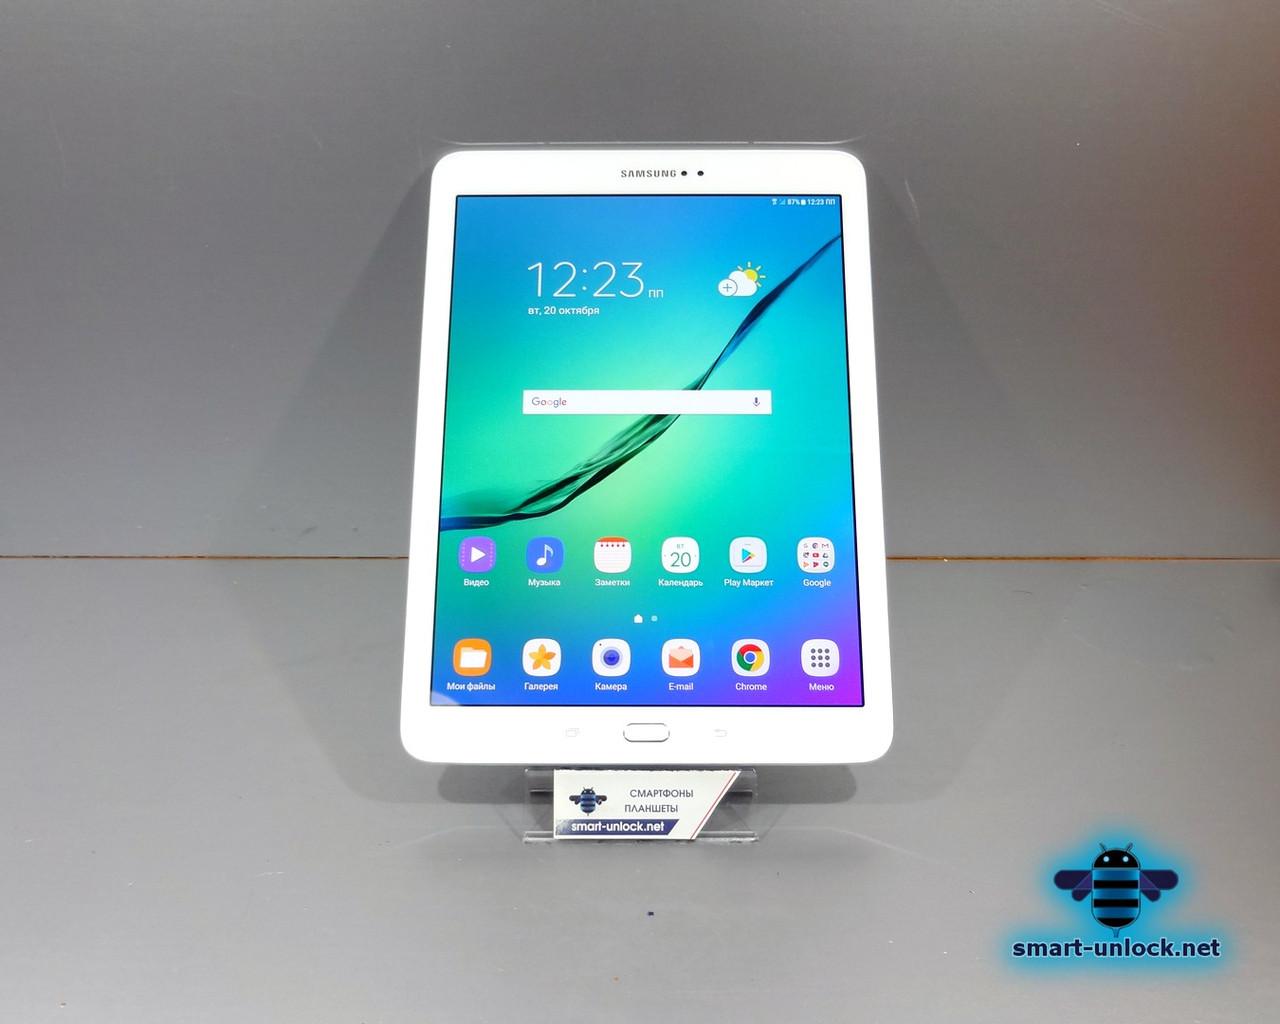 Планшет Samsung Galaxy Tab S2 9.7 4G. Покупка без риска. Гарантия!